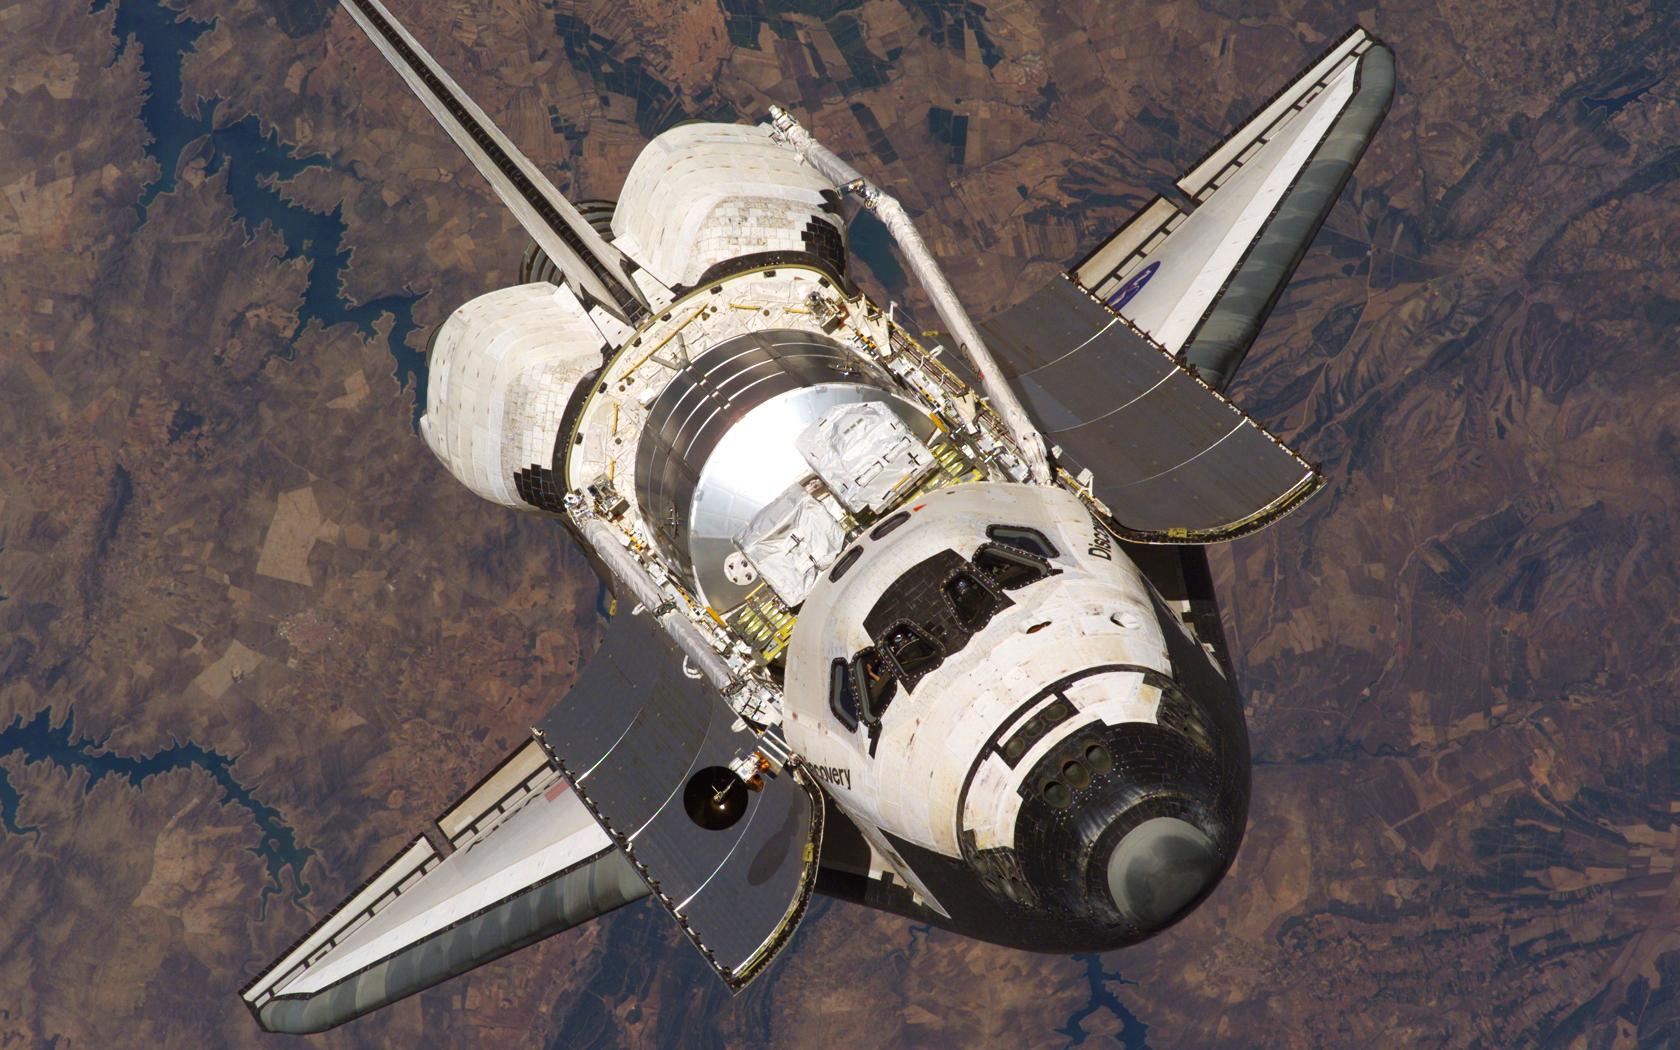 nasa space shuttle in orbit - photo #4